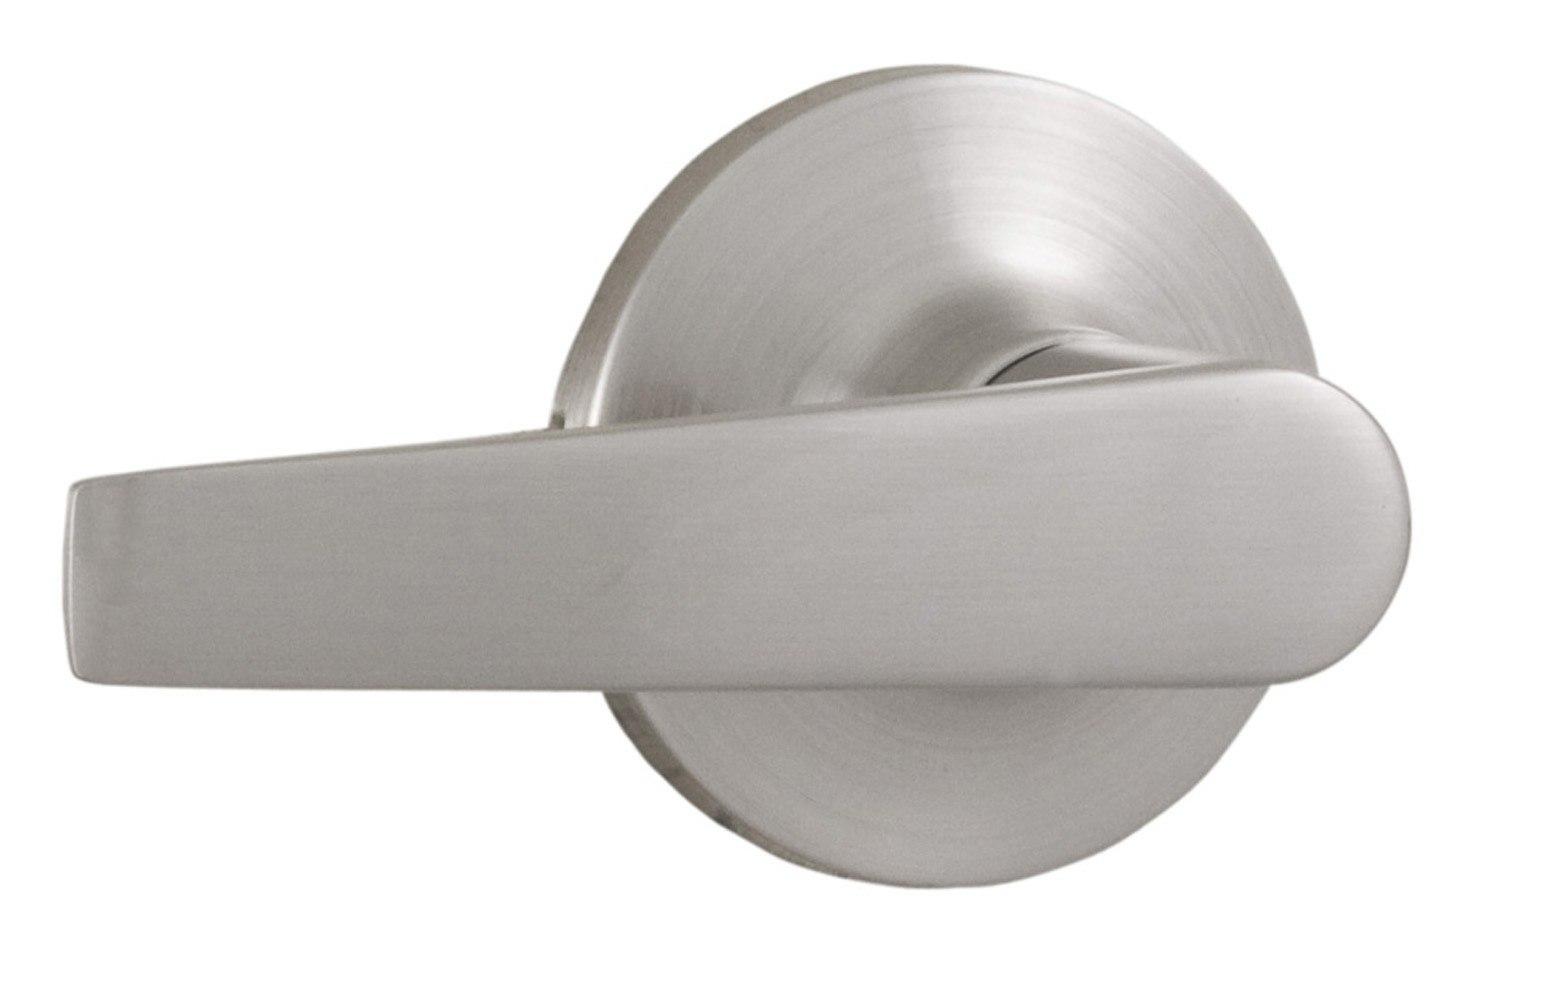 Weslock 00200WNWNFR20 Bristol Lever Satin Nickel